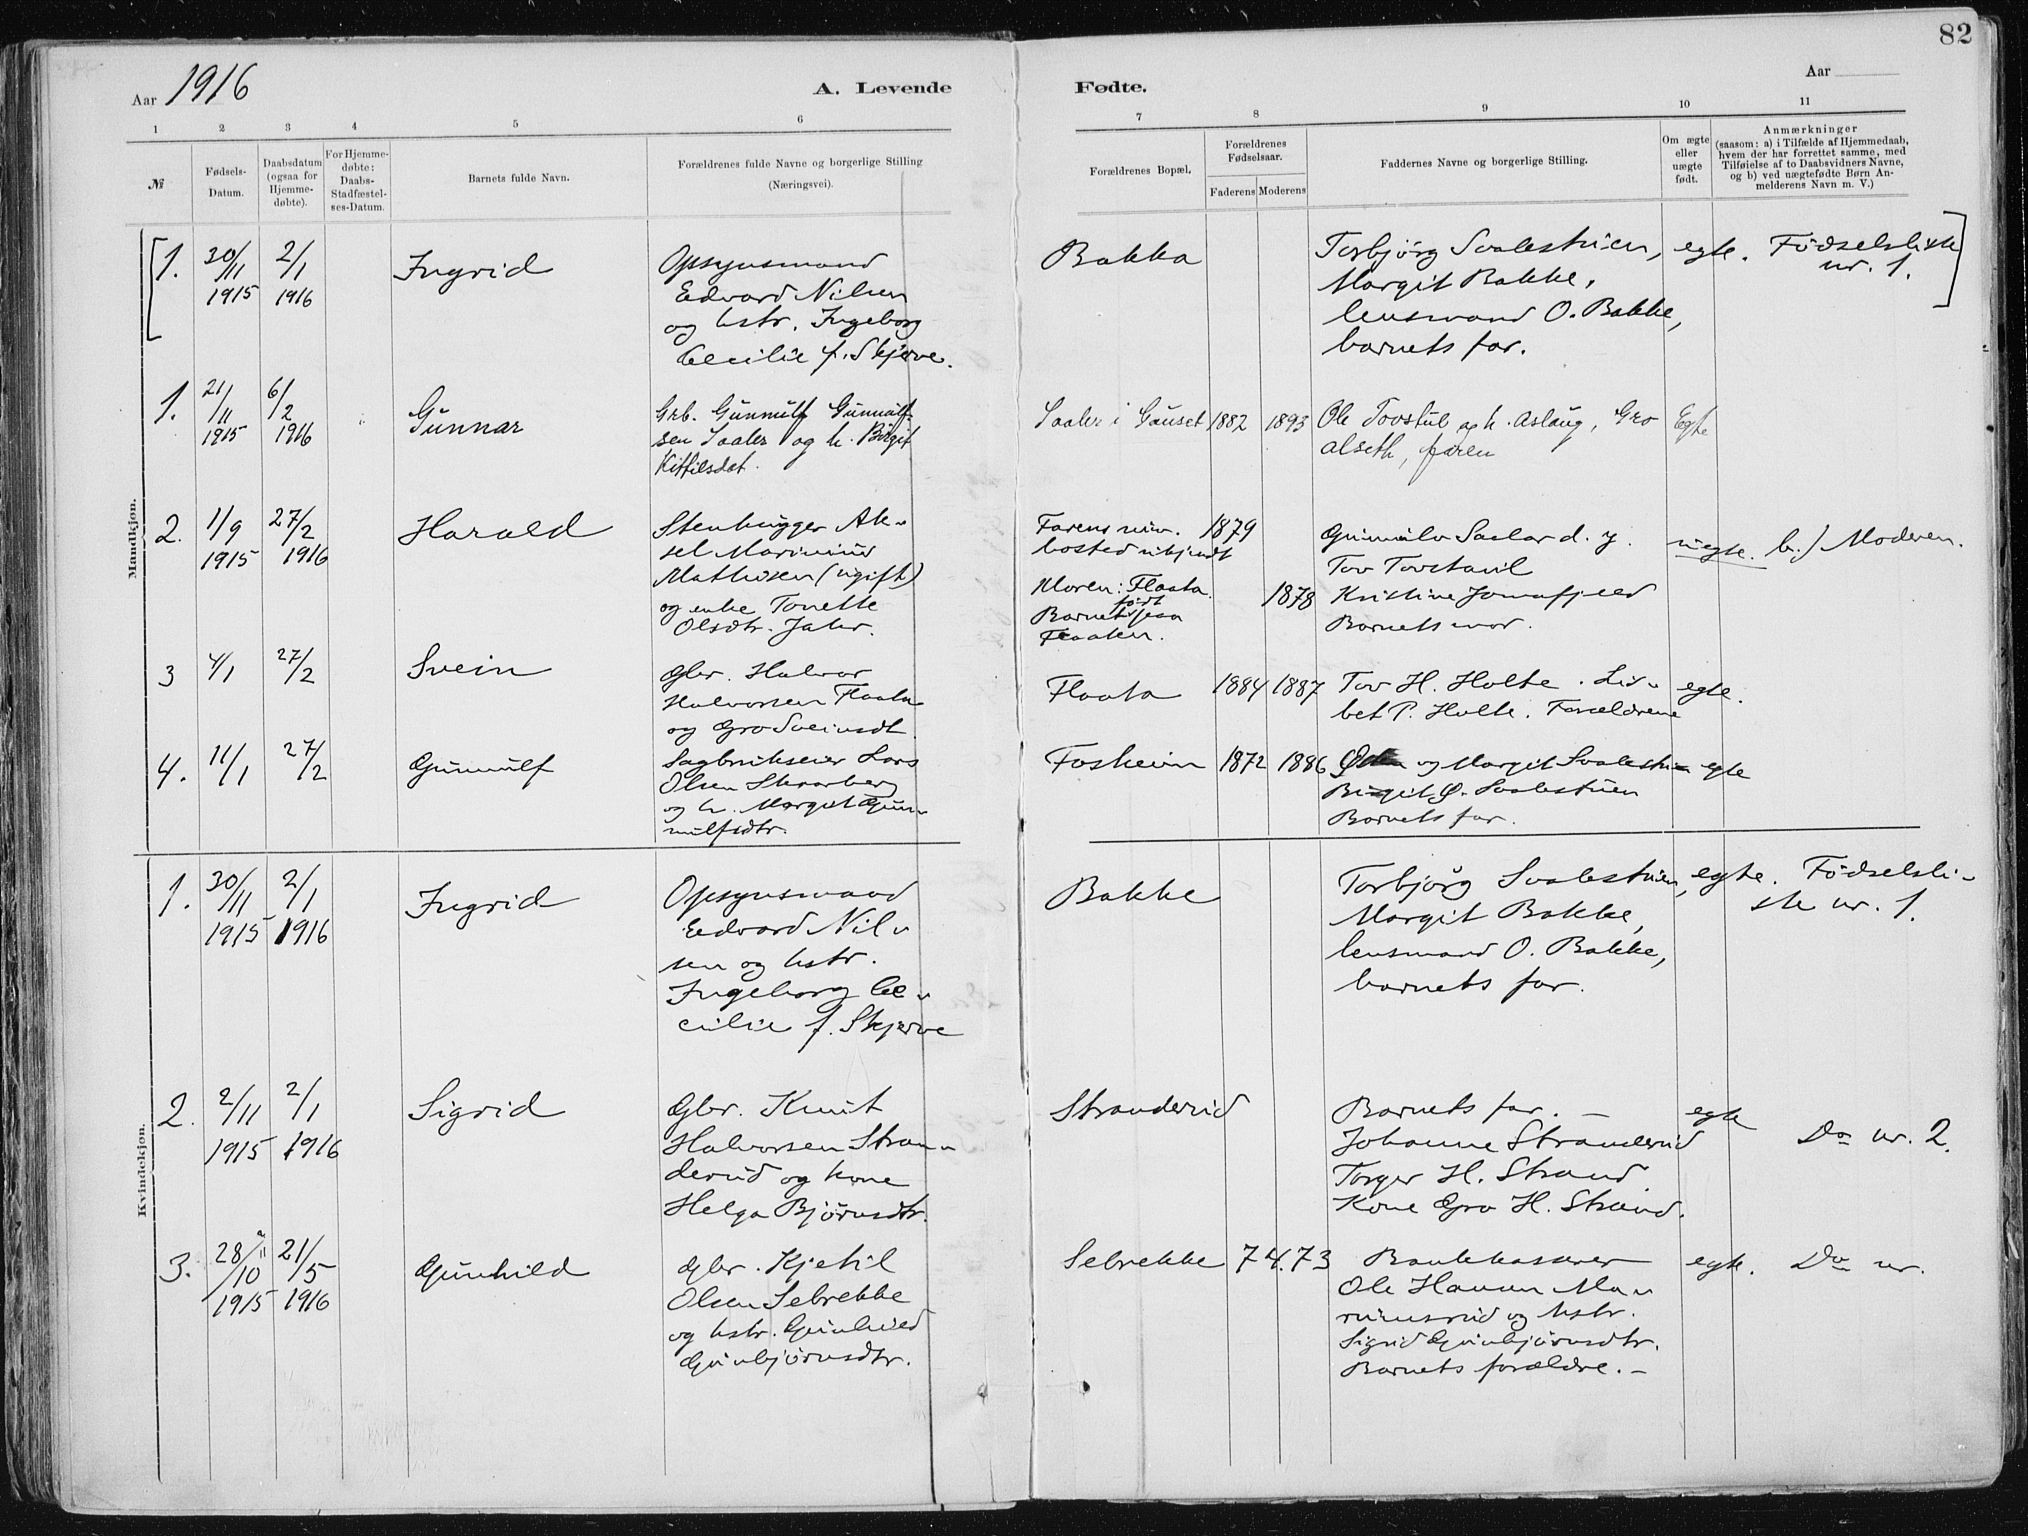 SAKO, Tinn kirkebøker, F/Fa/L0007: Ministerialbok nr. I 7, 1878-1922, s. 82